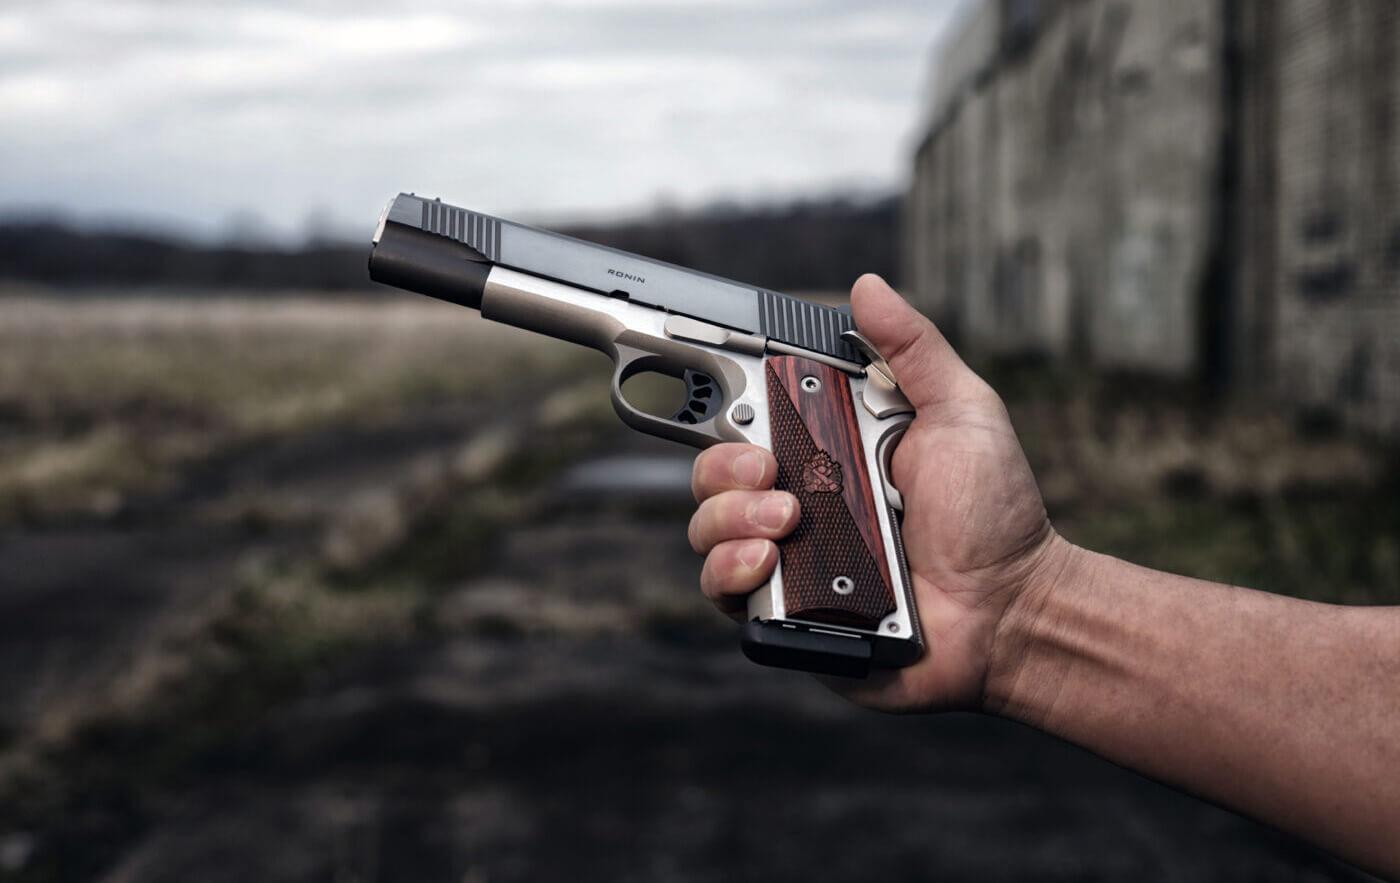 Holding a Ronin 1911 pistol